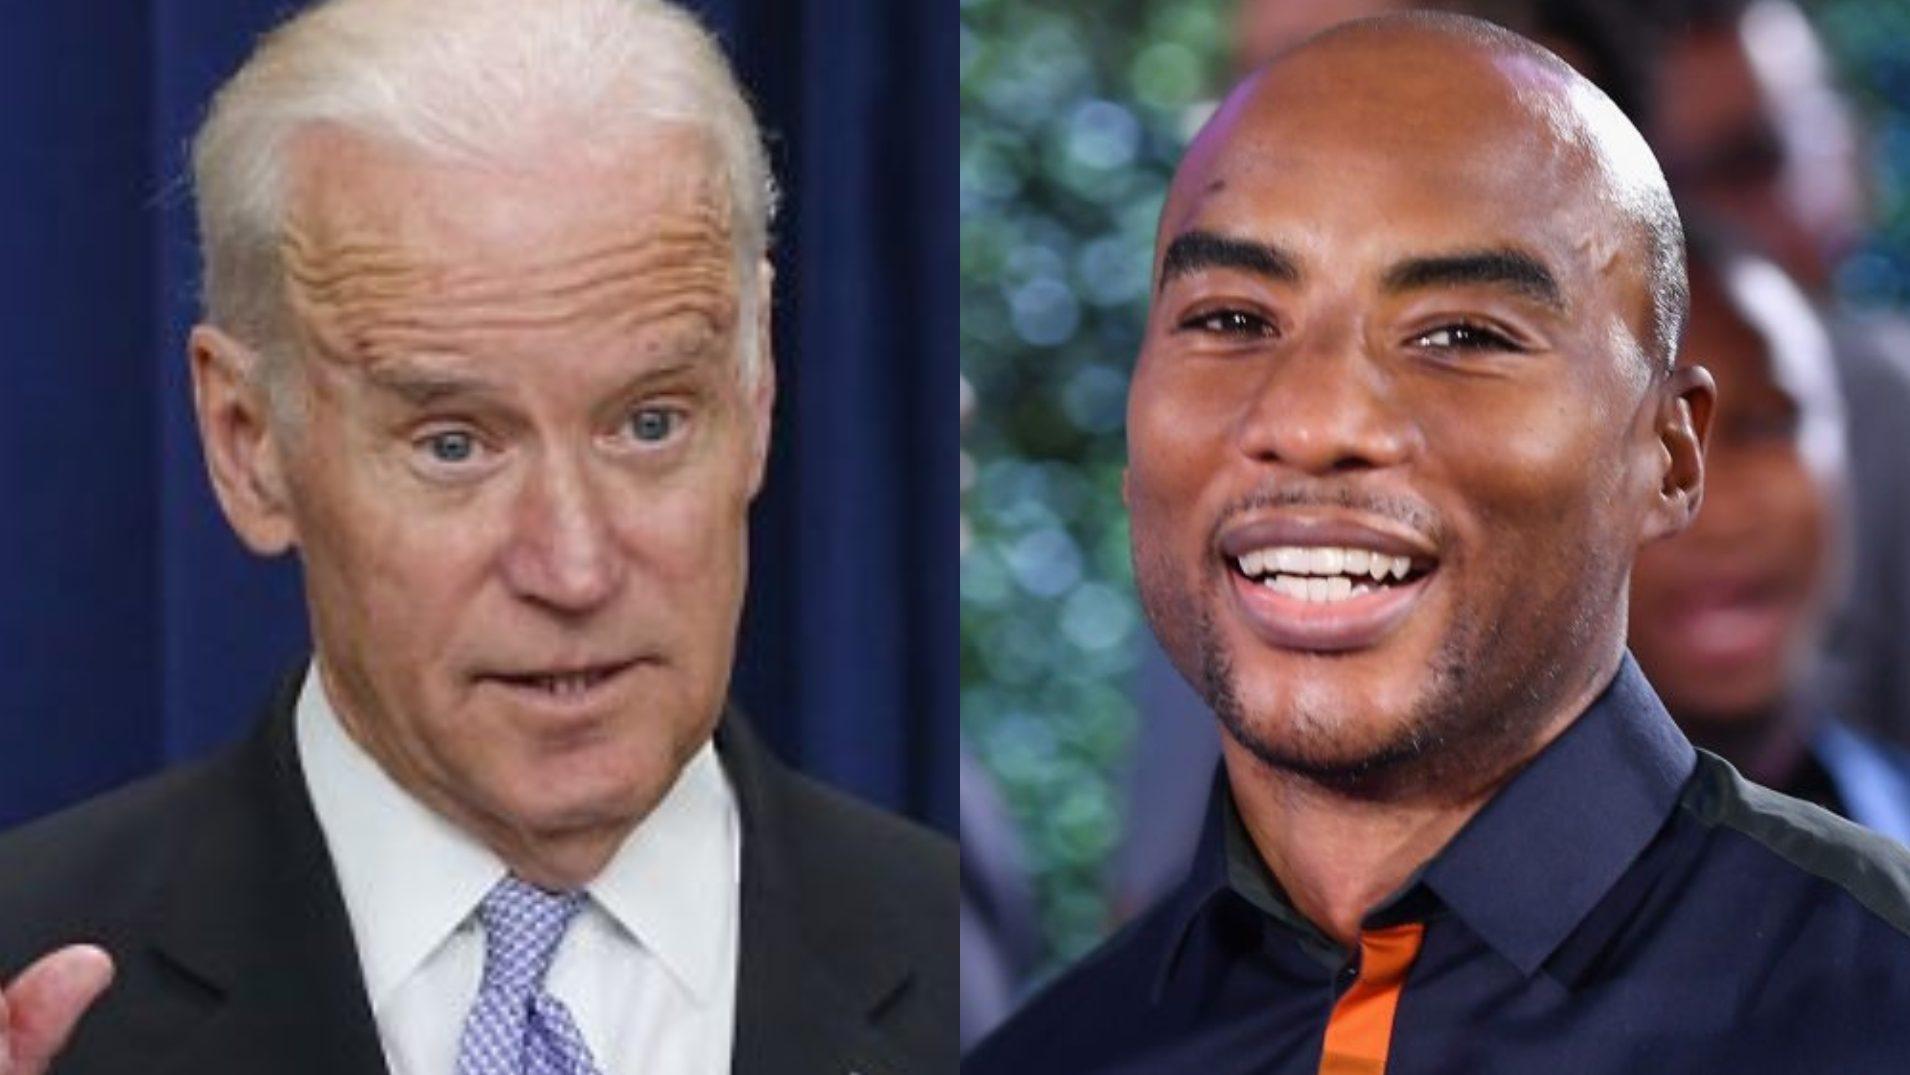 Charlamagne Tha God responds to Biden 'You ain't Black' backlash